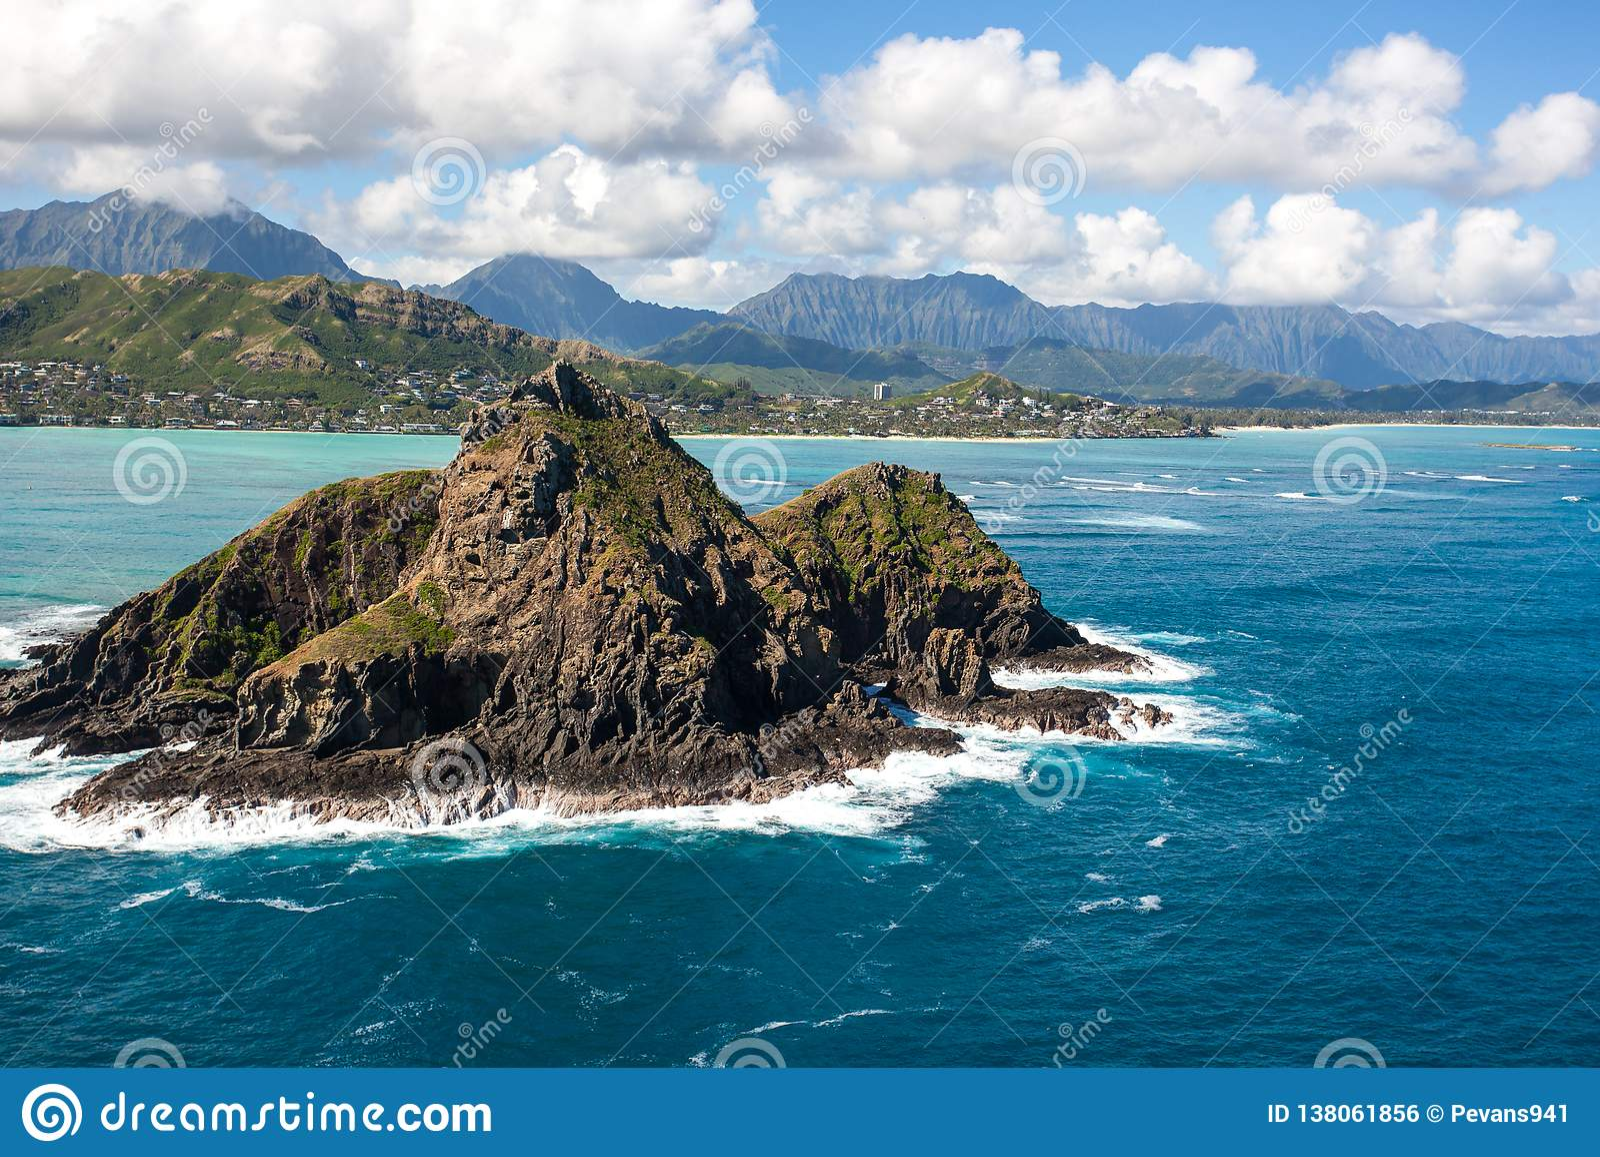 Tropical Scenic Kayaking At The Mokulua Islands Oahu Hawaii